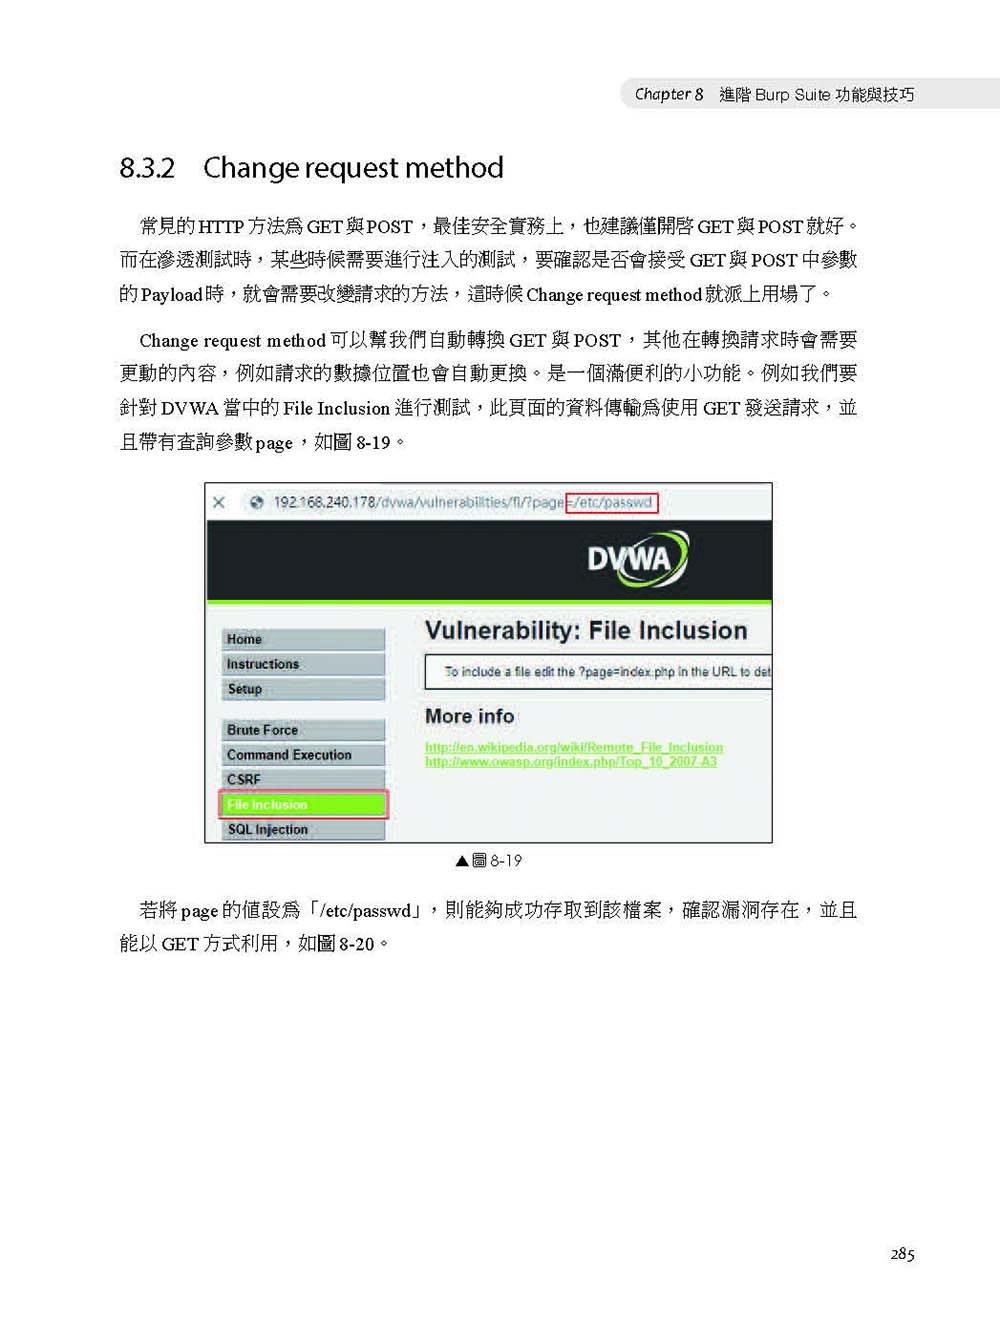 WebSecurity 網站滲透測試:Burp Suite 完全學習指南 (iT邦幫忙鐵人賽系列書)-preview-13